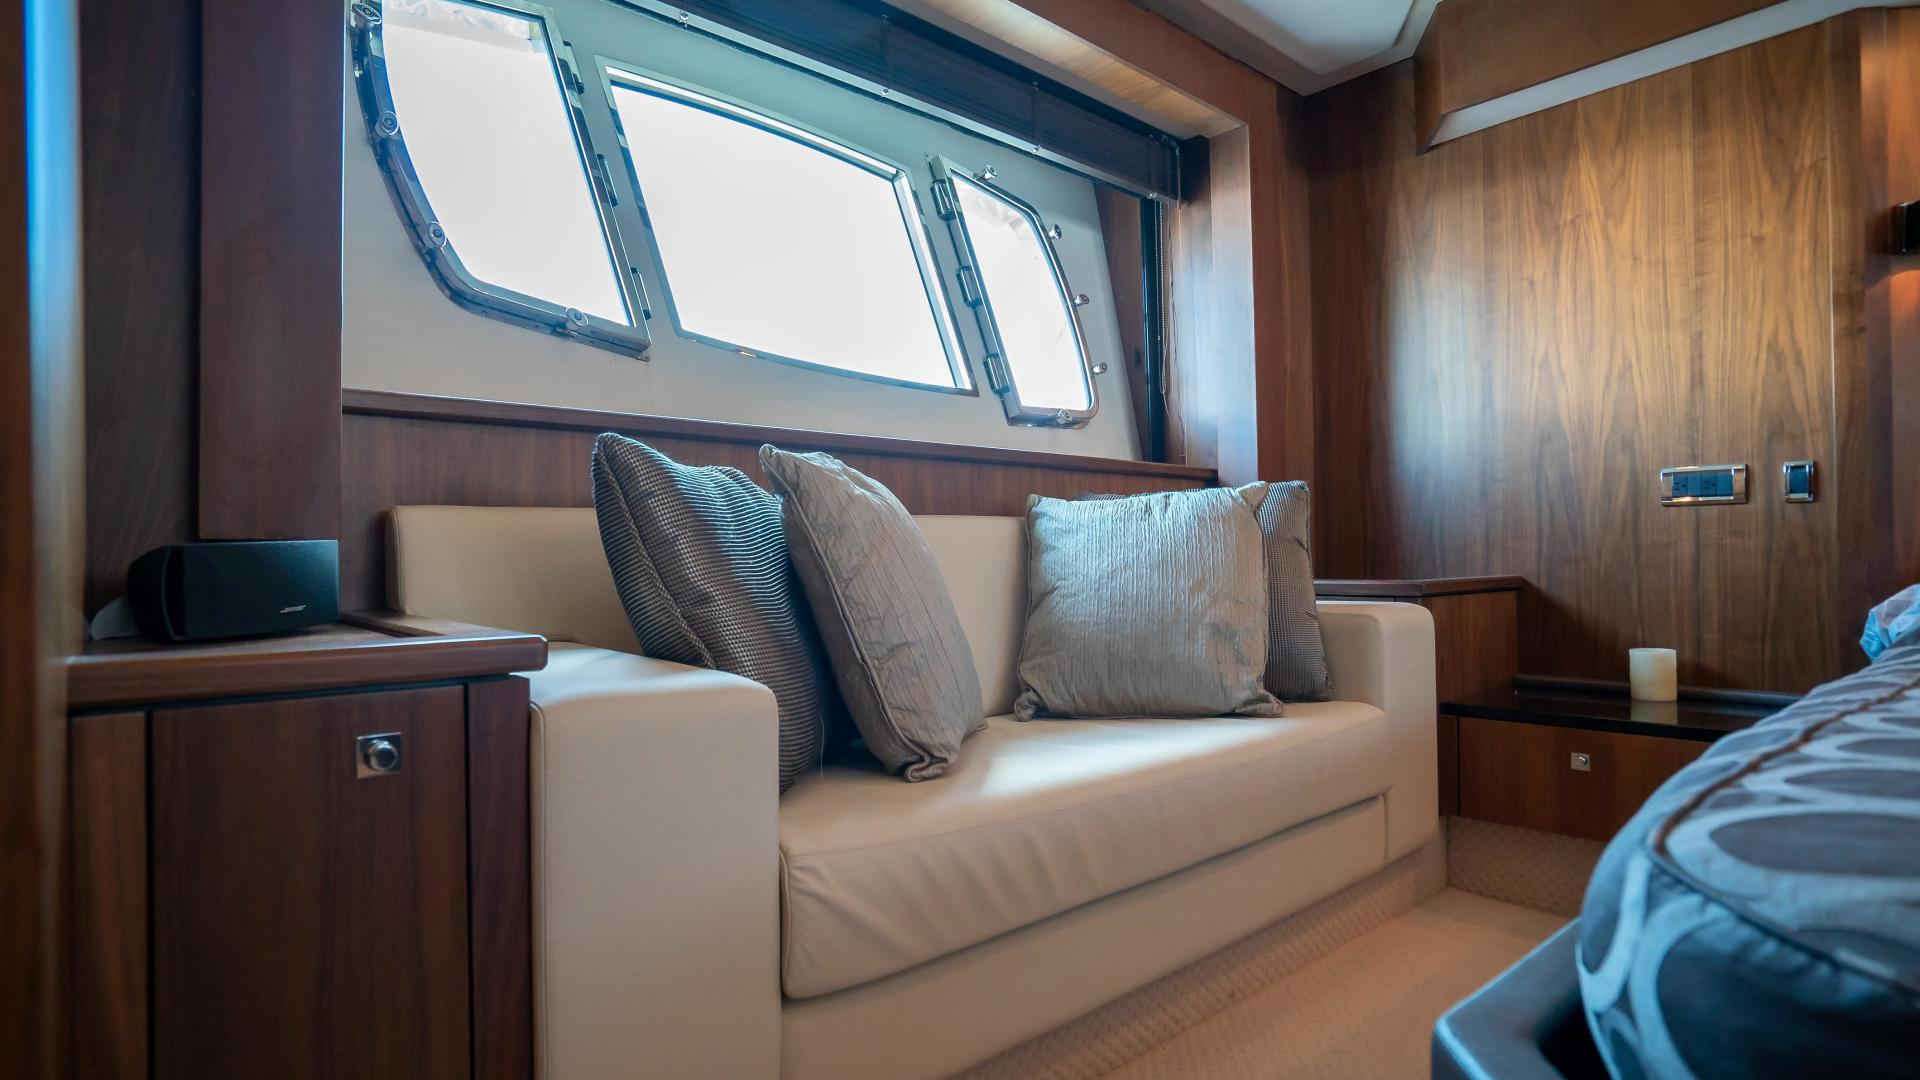 Sunseeker-Motor yacht 2012-JIMBO New Port-Rhode Island-United States-1480164 | Thumbnail